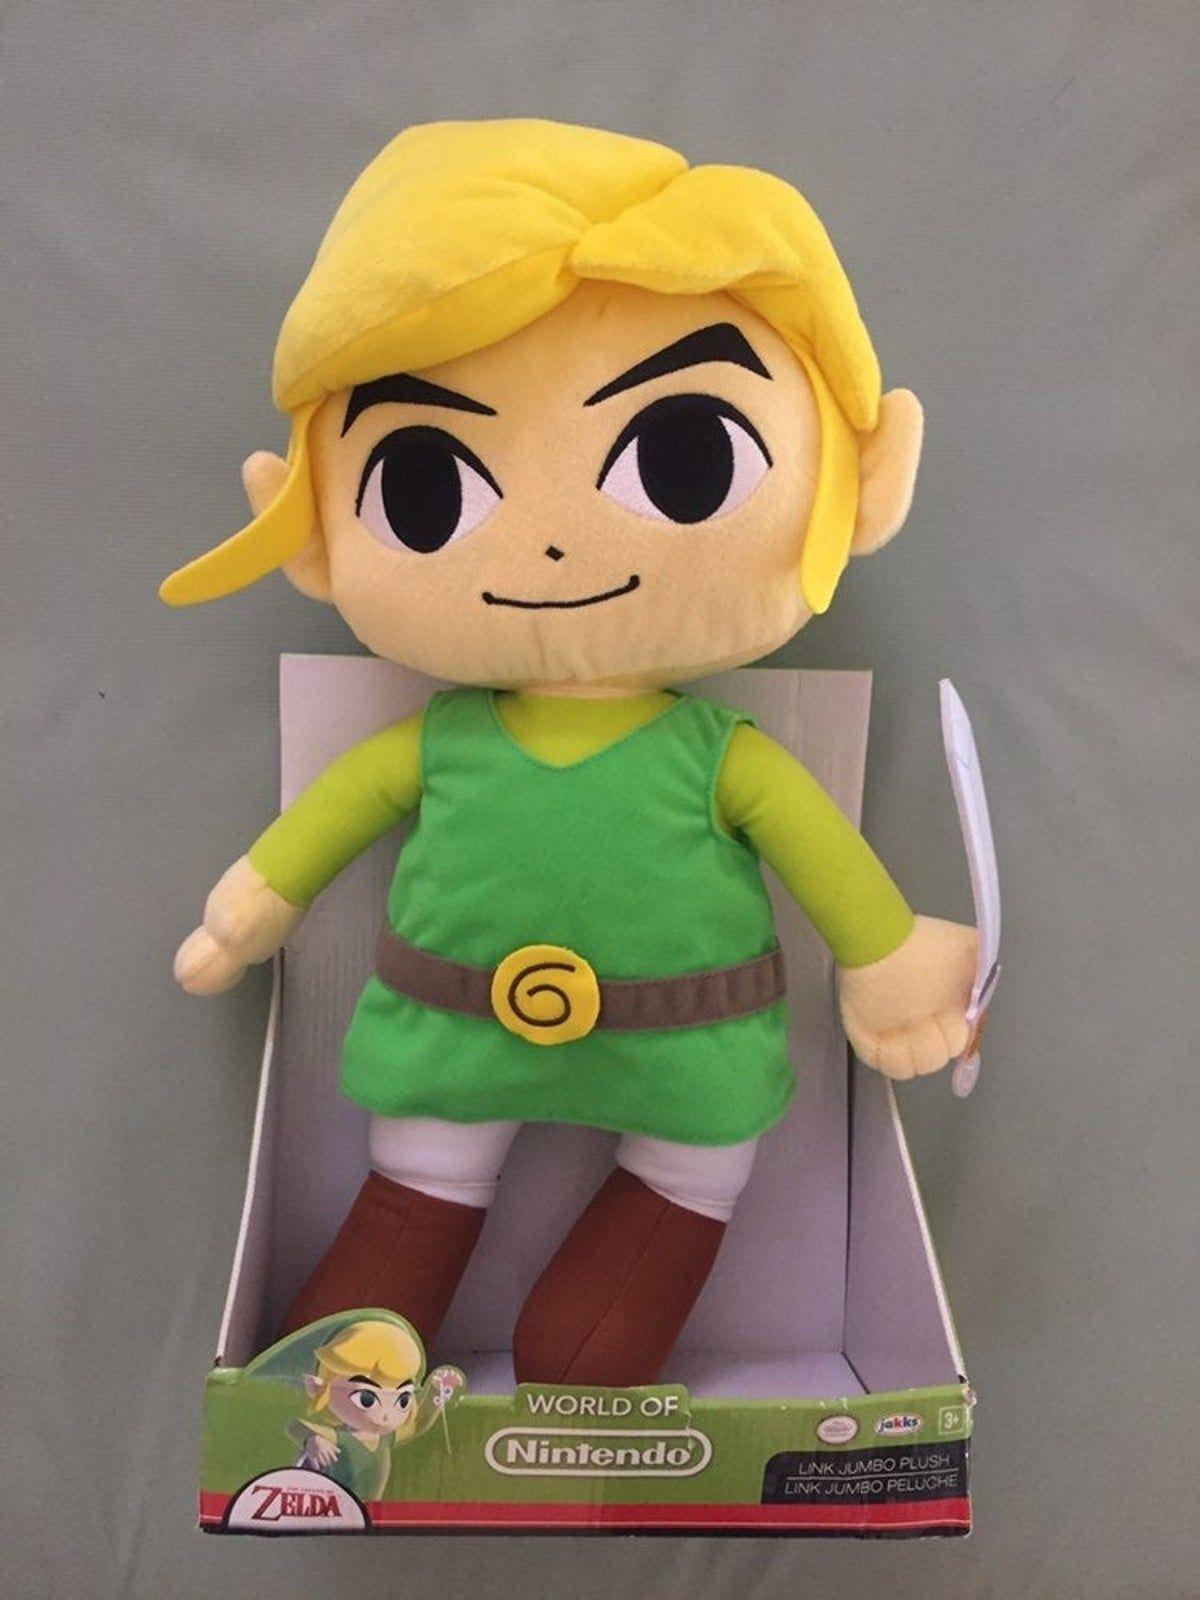 Toon Link Jakks Pacific 19 Plush In 2020 Plush Zelda Video Games Pacific